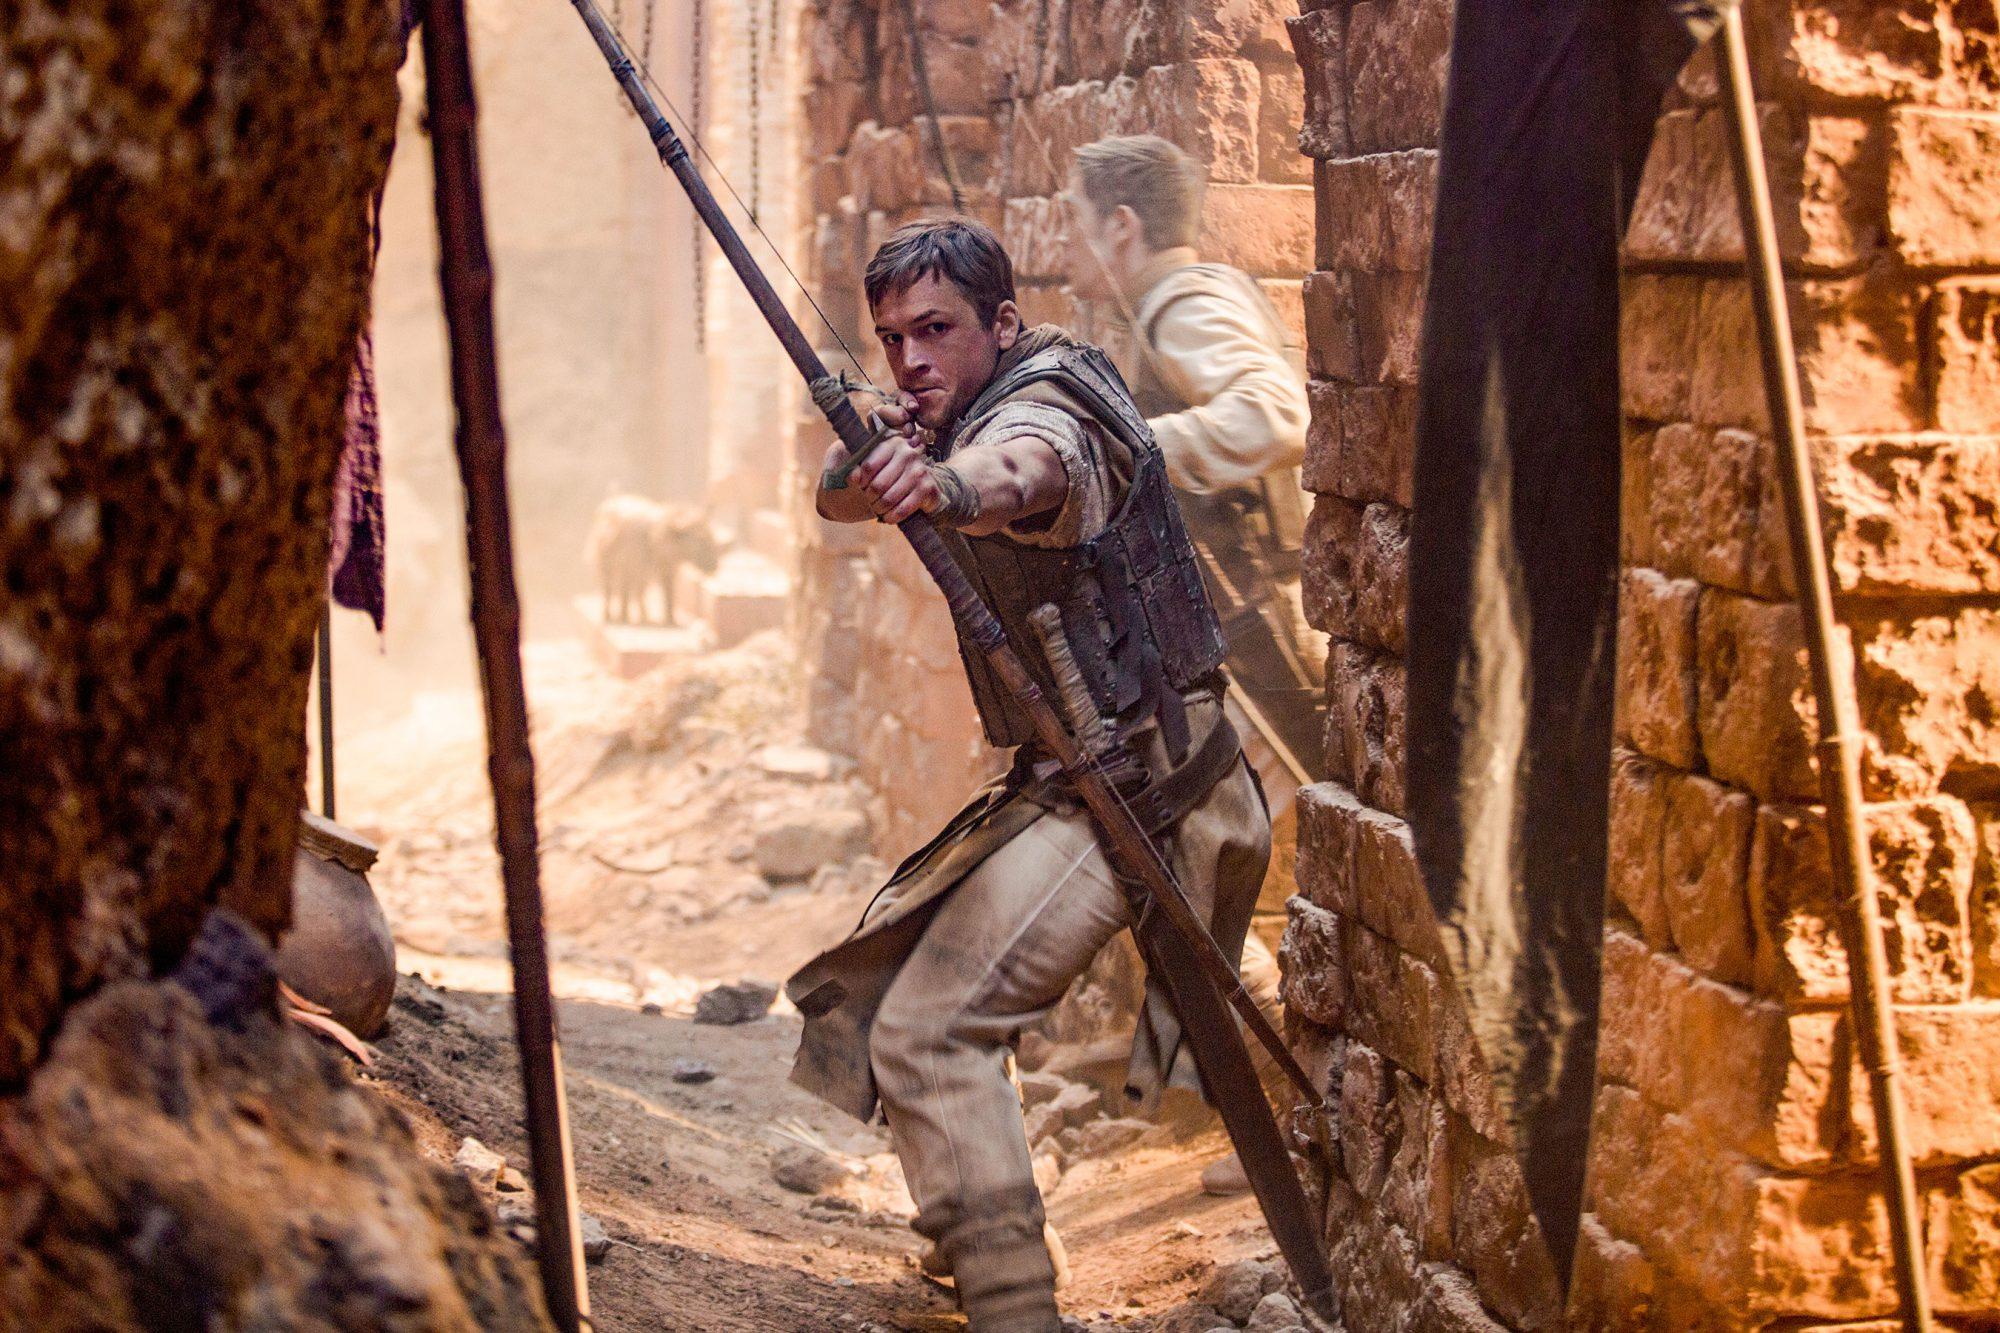 Taron Egerton stars as 'Robin' in ROBIN HOOD. Photo Credit: Larry Horricks/Lionsgate